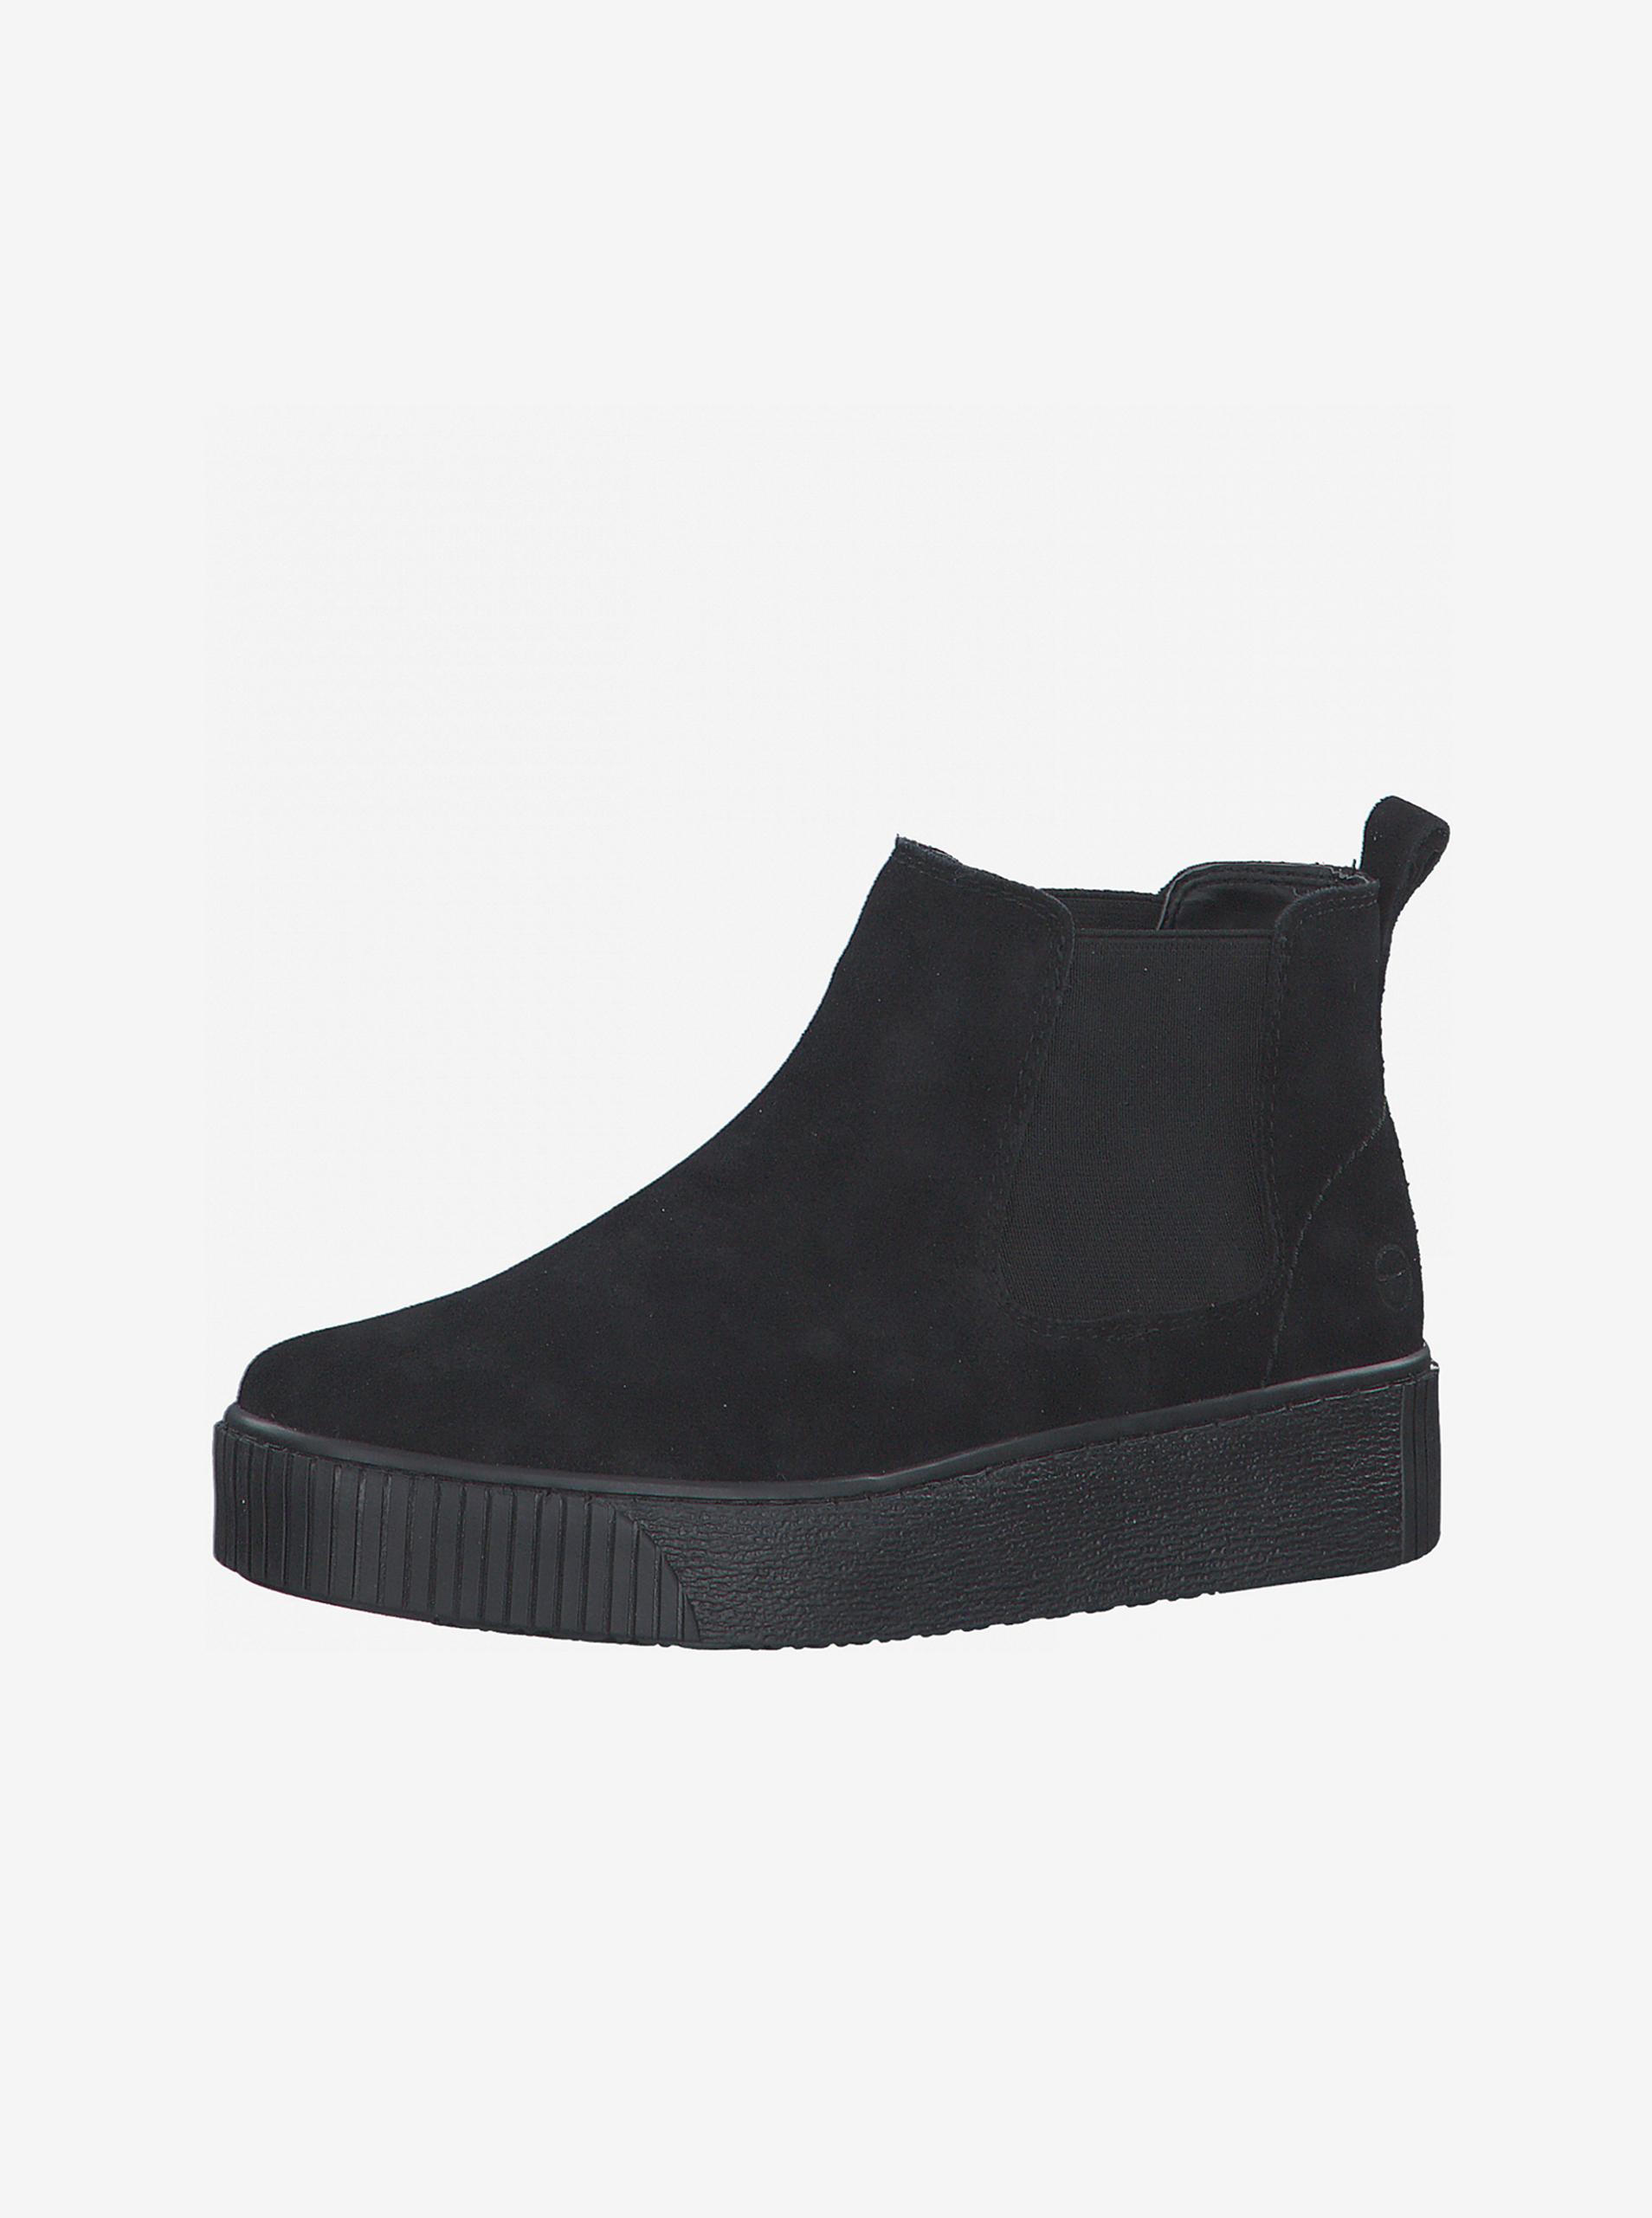 Tamaris čierne semišové chelsea topánky na platforme - 41